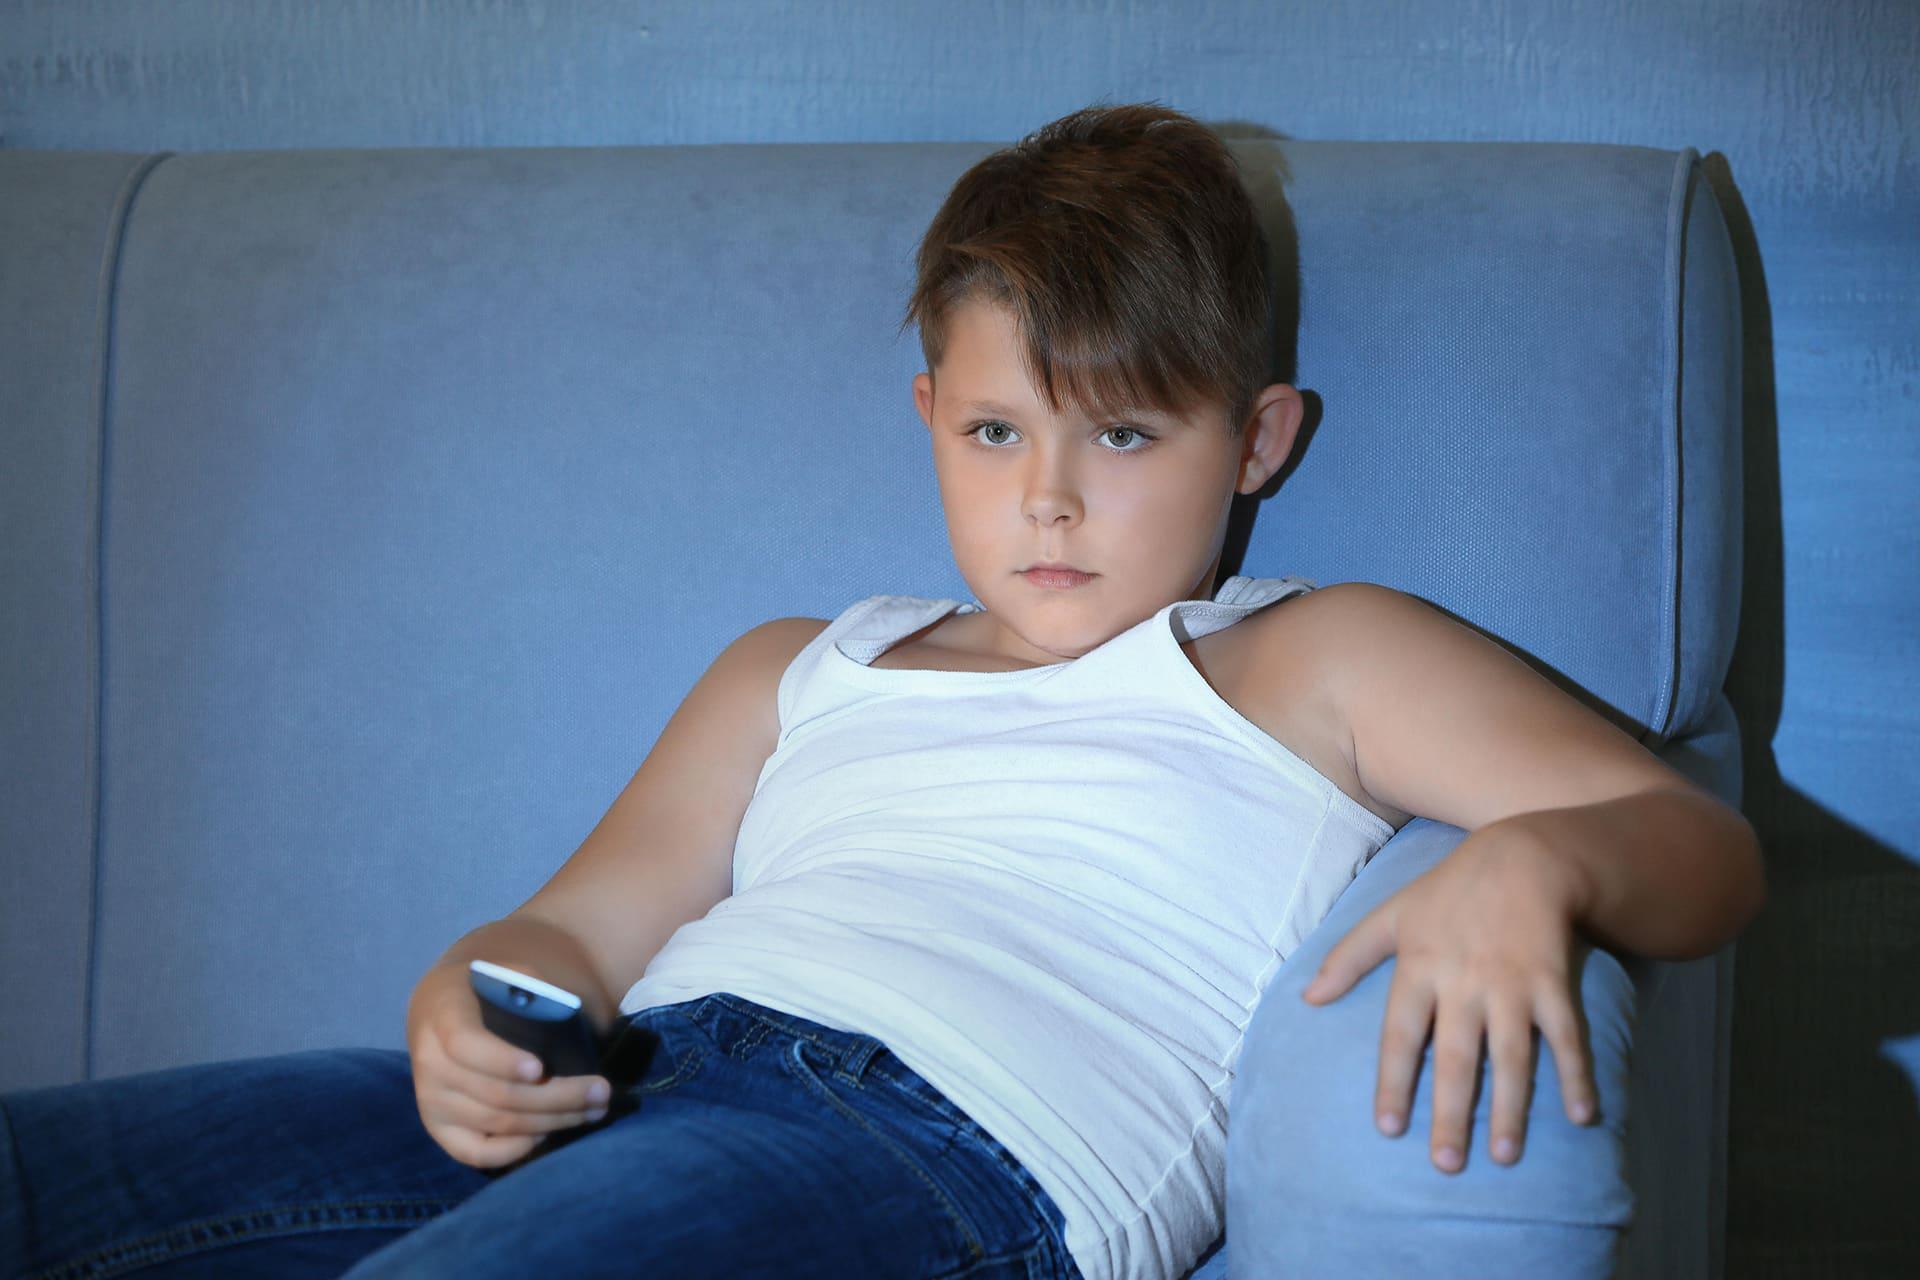 Nuori poika katsoo telkkaria.